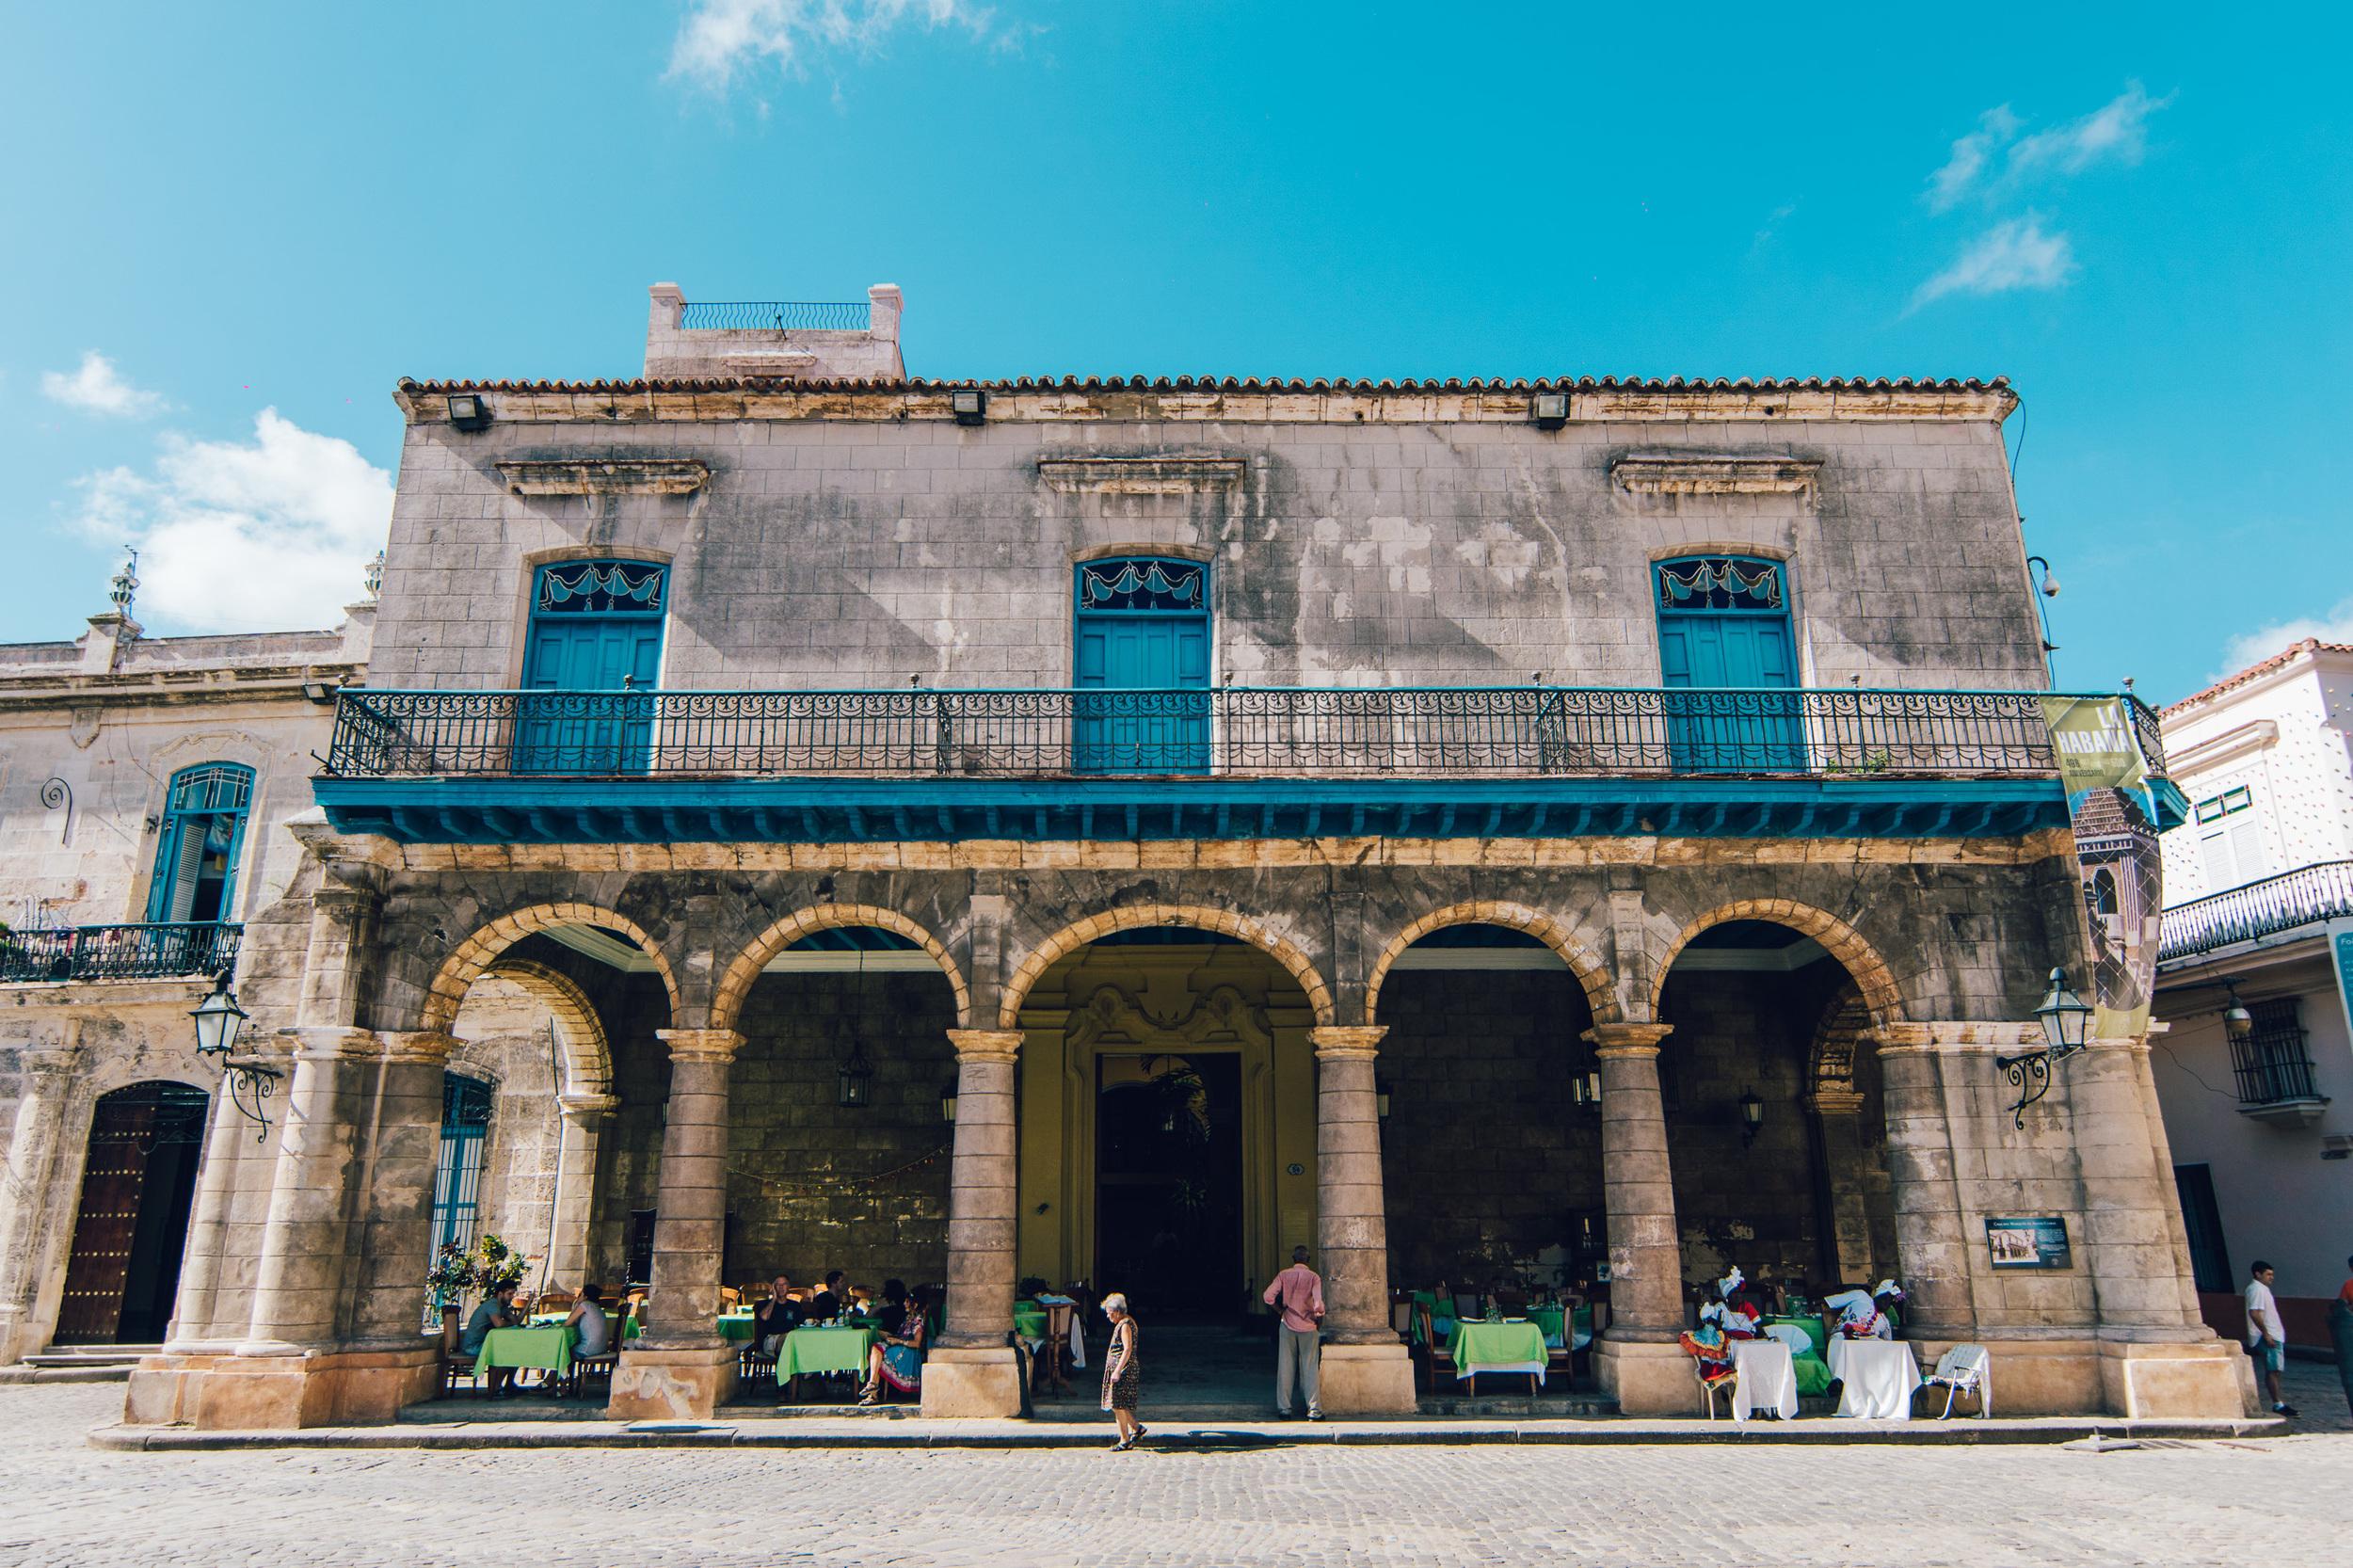 DeClaro-Photography-Cuba-02269.jpg